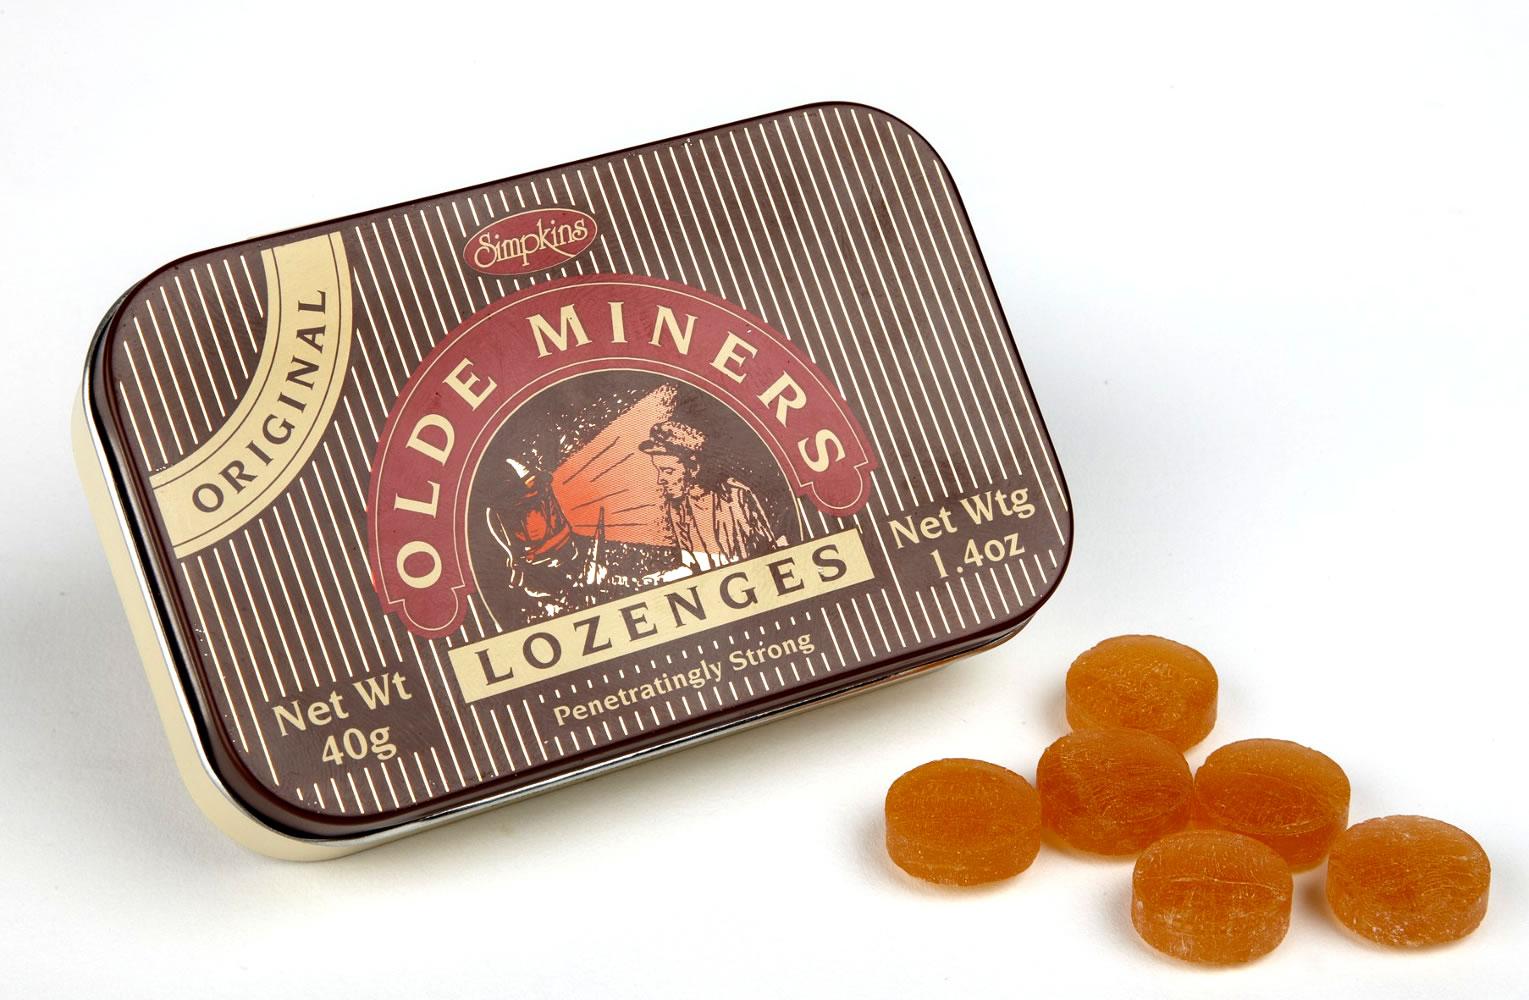 Olde Miners Original Lozenges 40g Tin